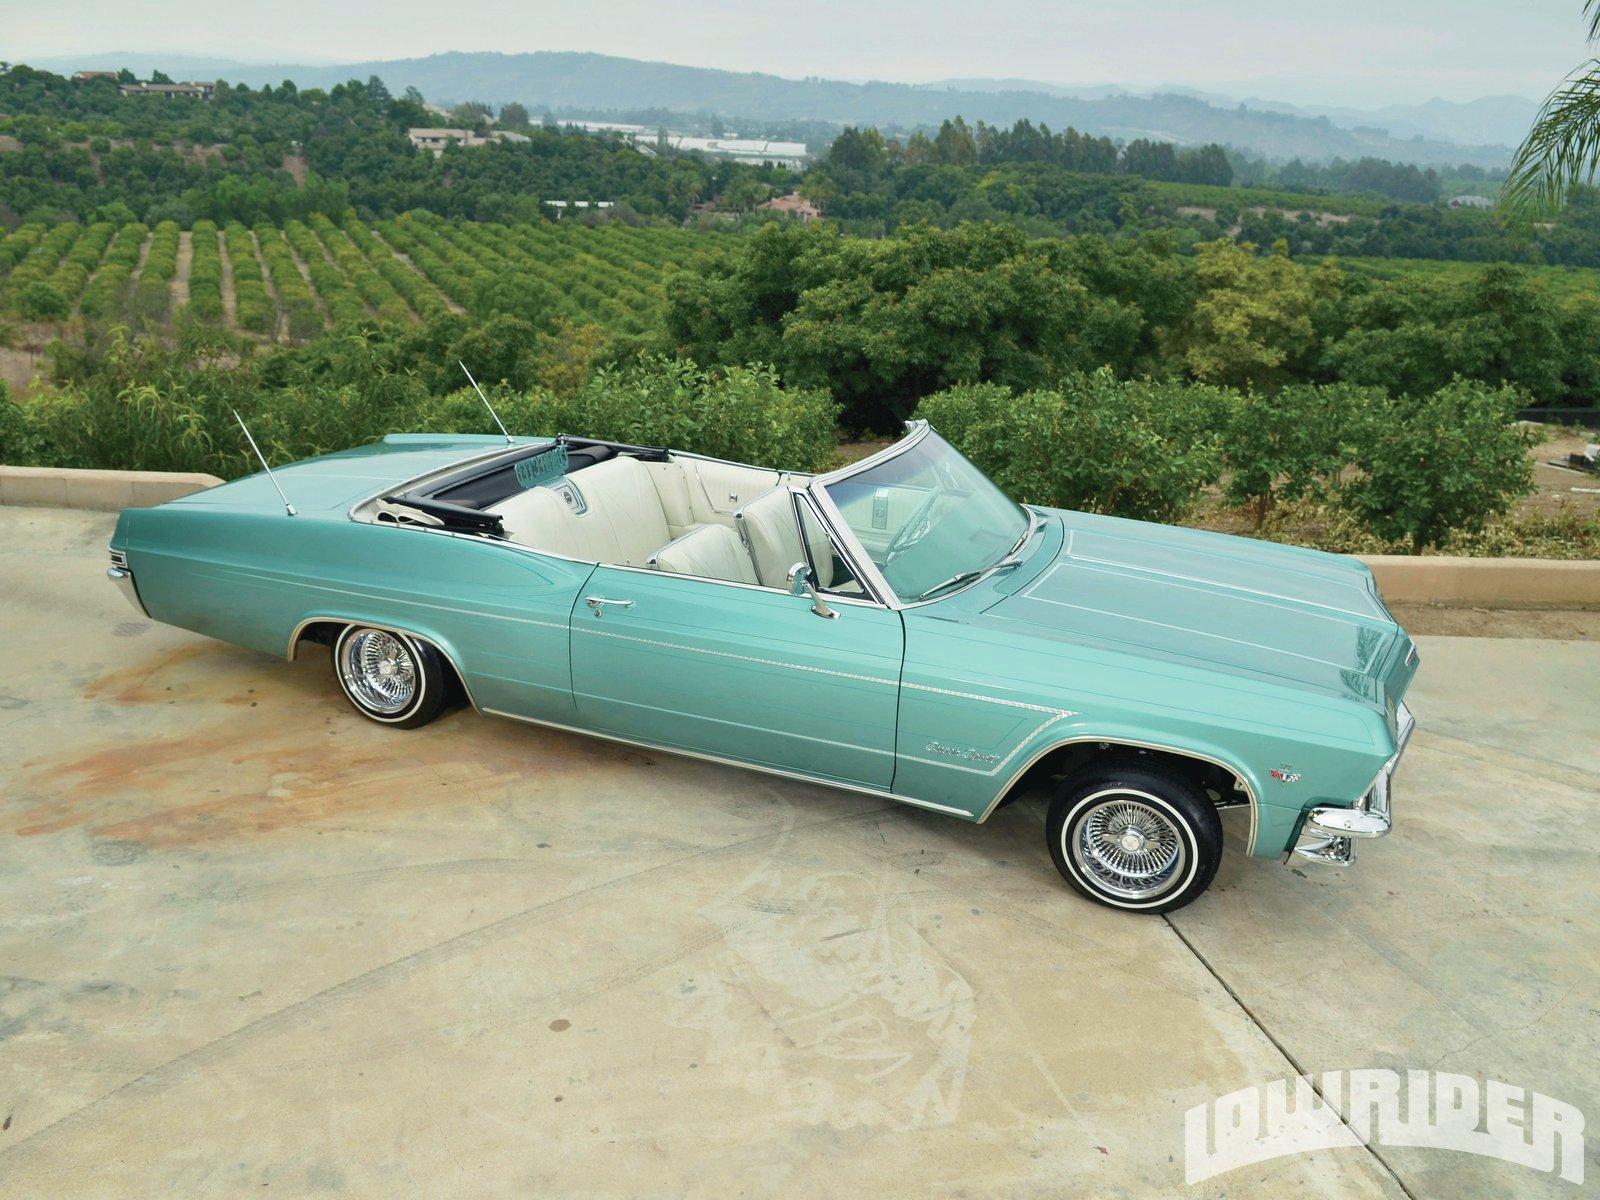 1965 Chevrolet Impala Ss Convertible Fantasy Five